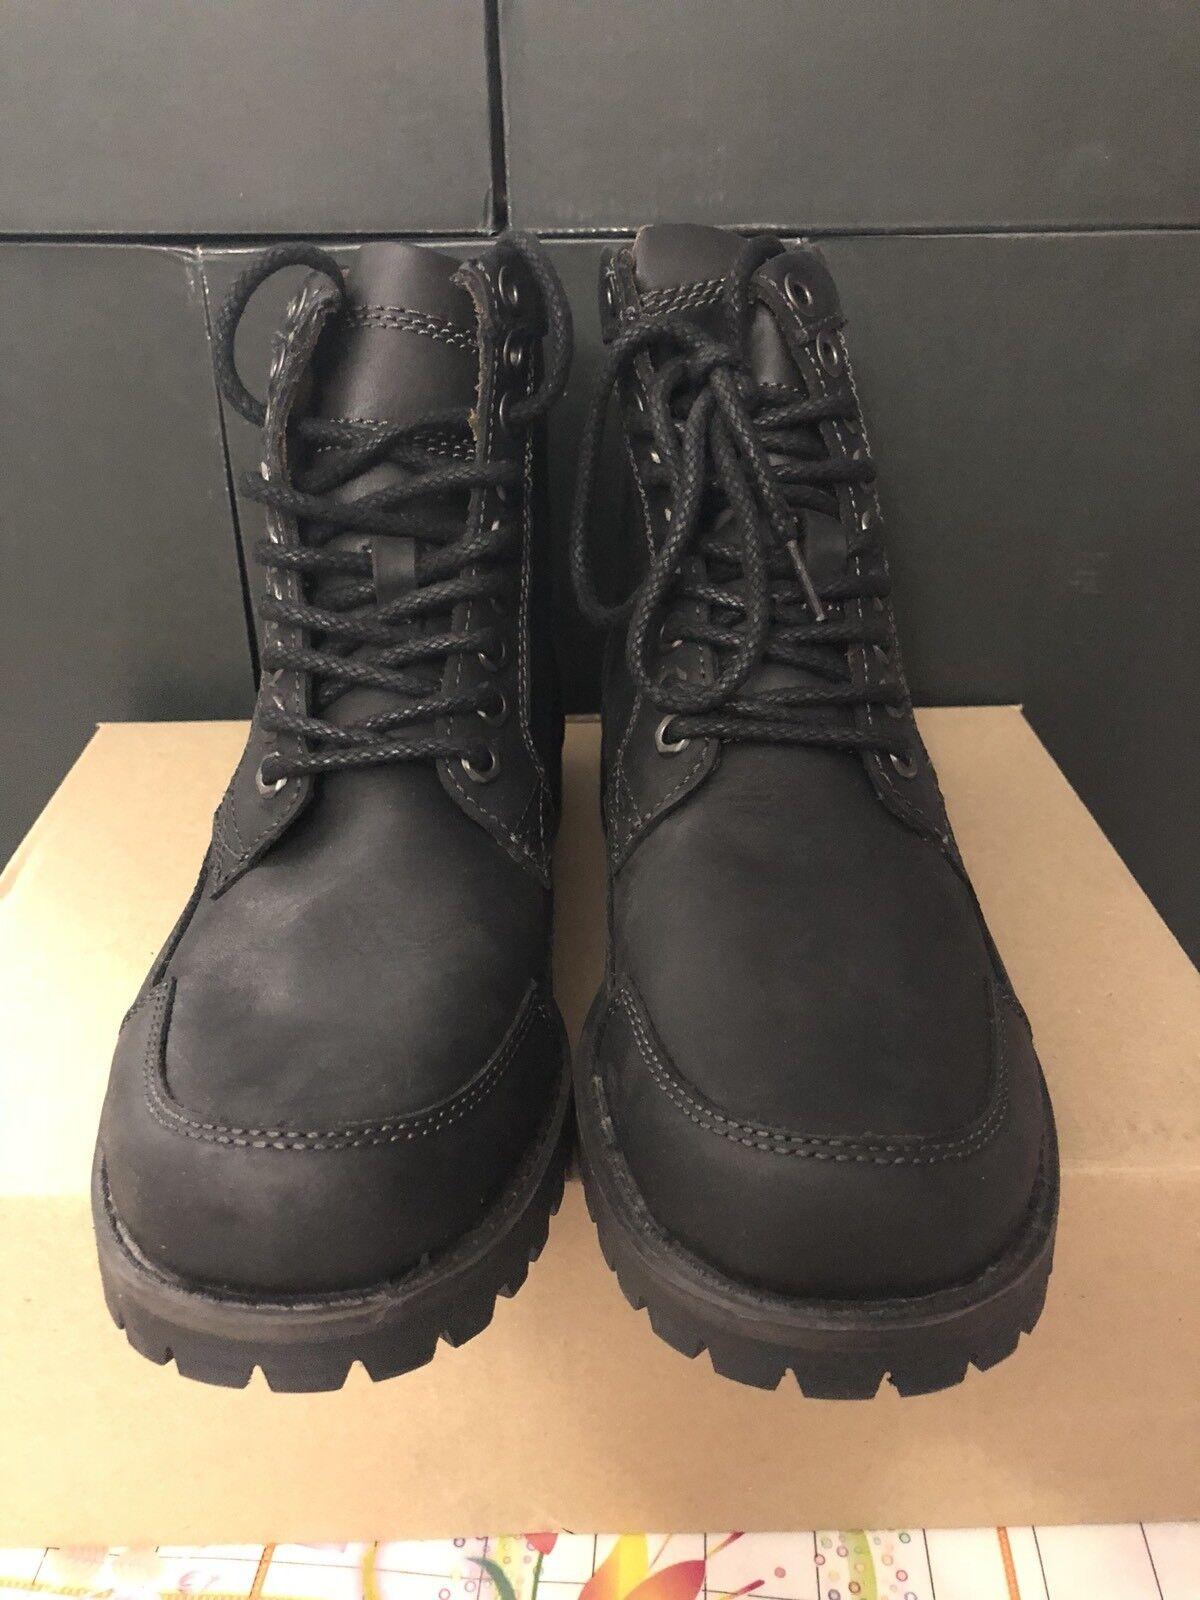 Dockers Hi Bottes 8 Noir 08322-0001 UK 7 US 8 Bottes Eu 41 b1a578